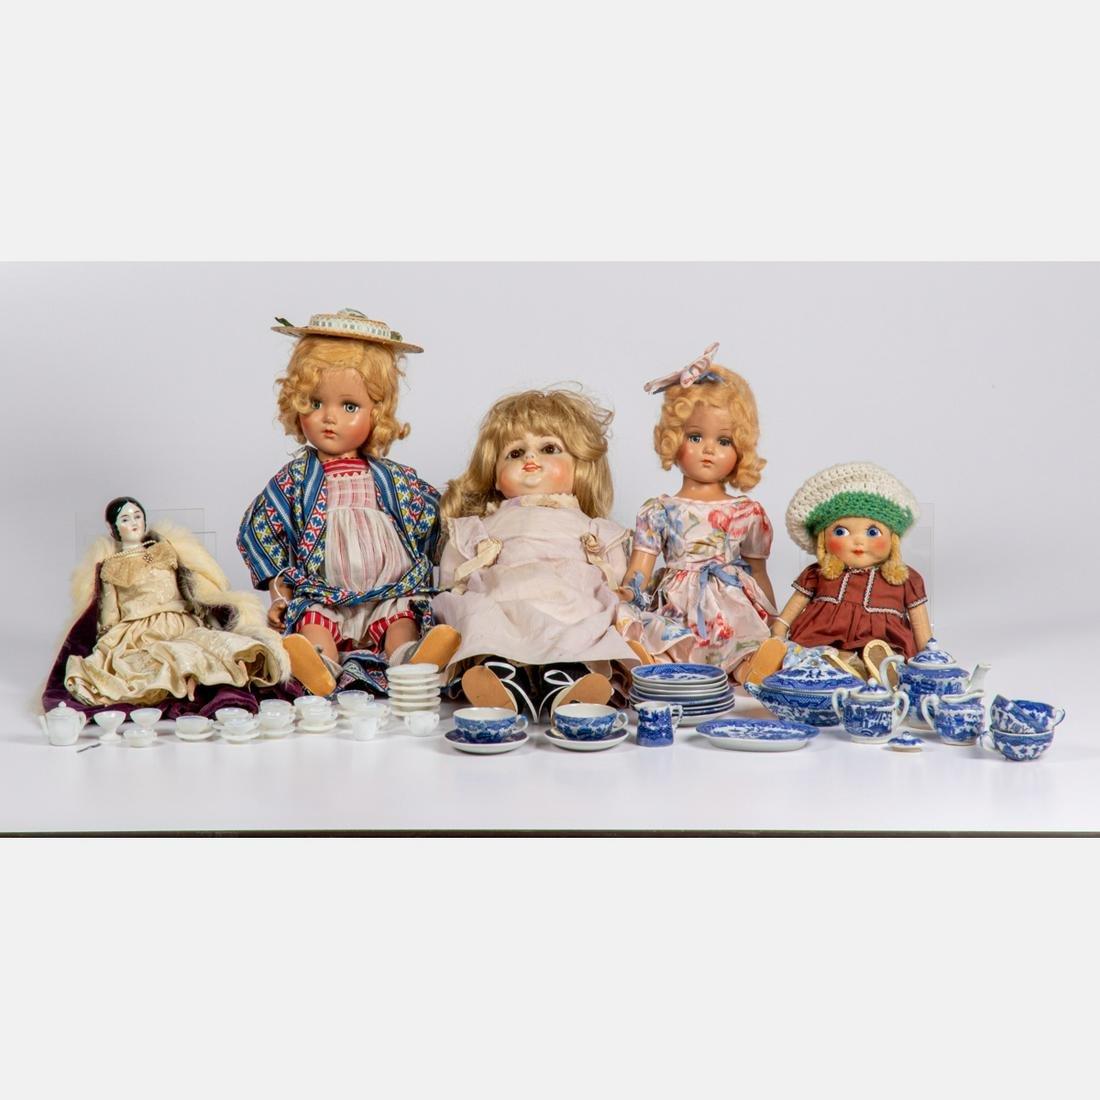 Five Continental Antique and Semi-Antique Dolls